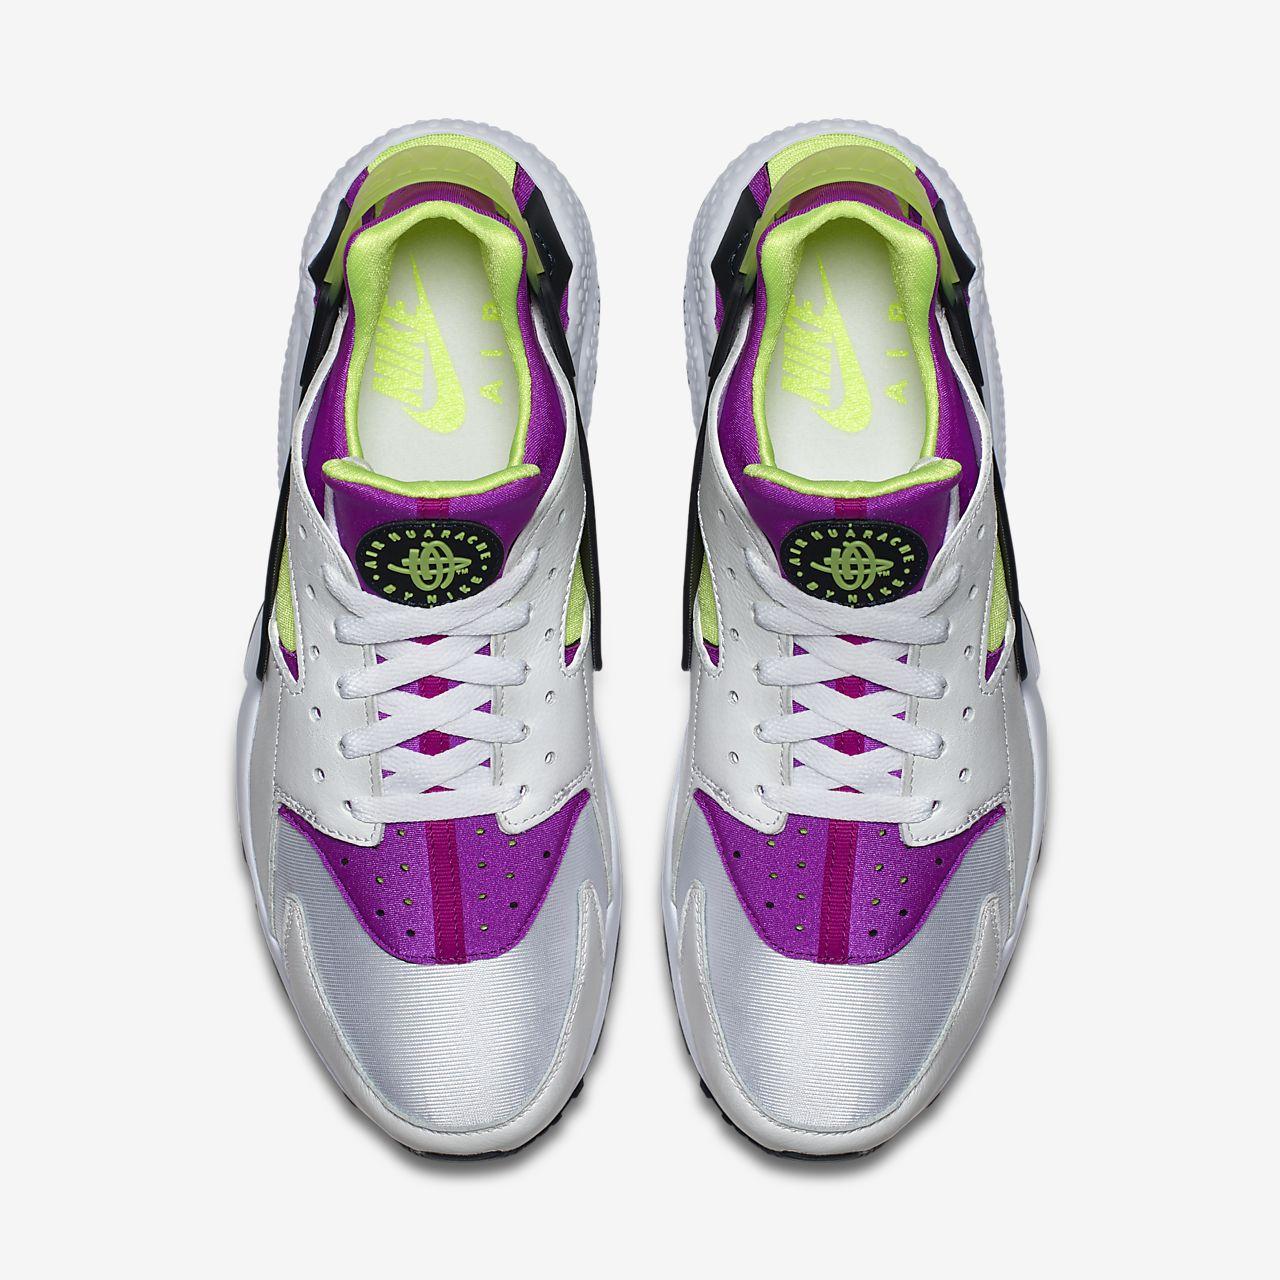 low priced 6ab59 5dacf ... Nike Air Huarache  91 QS Men s Shoe